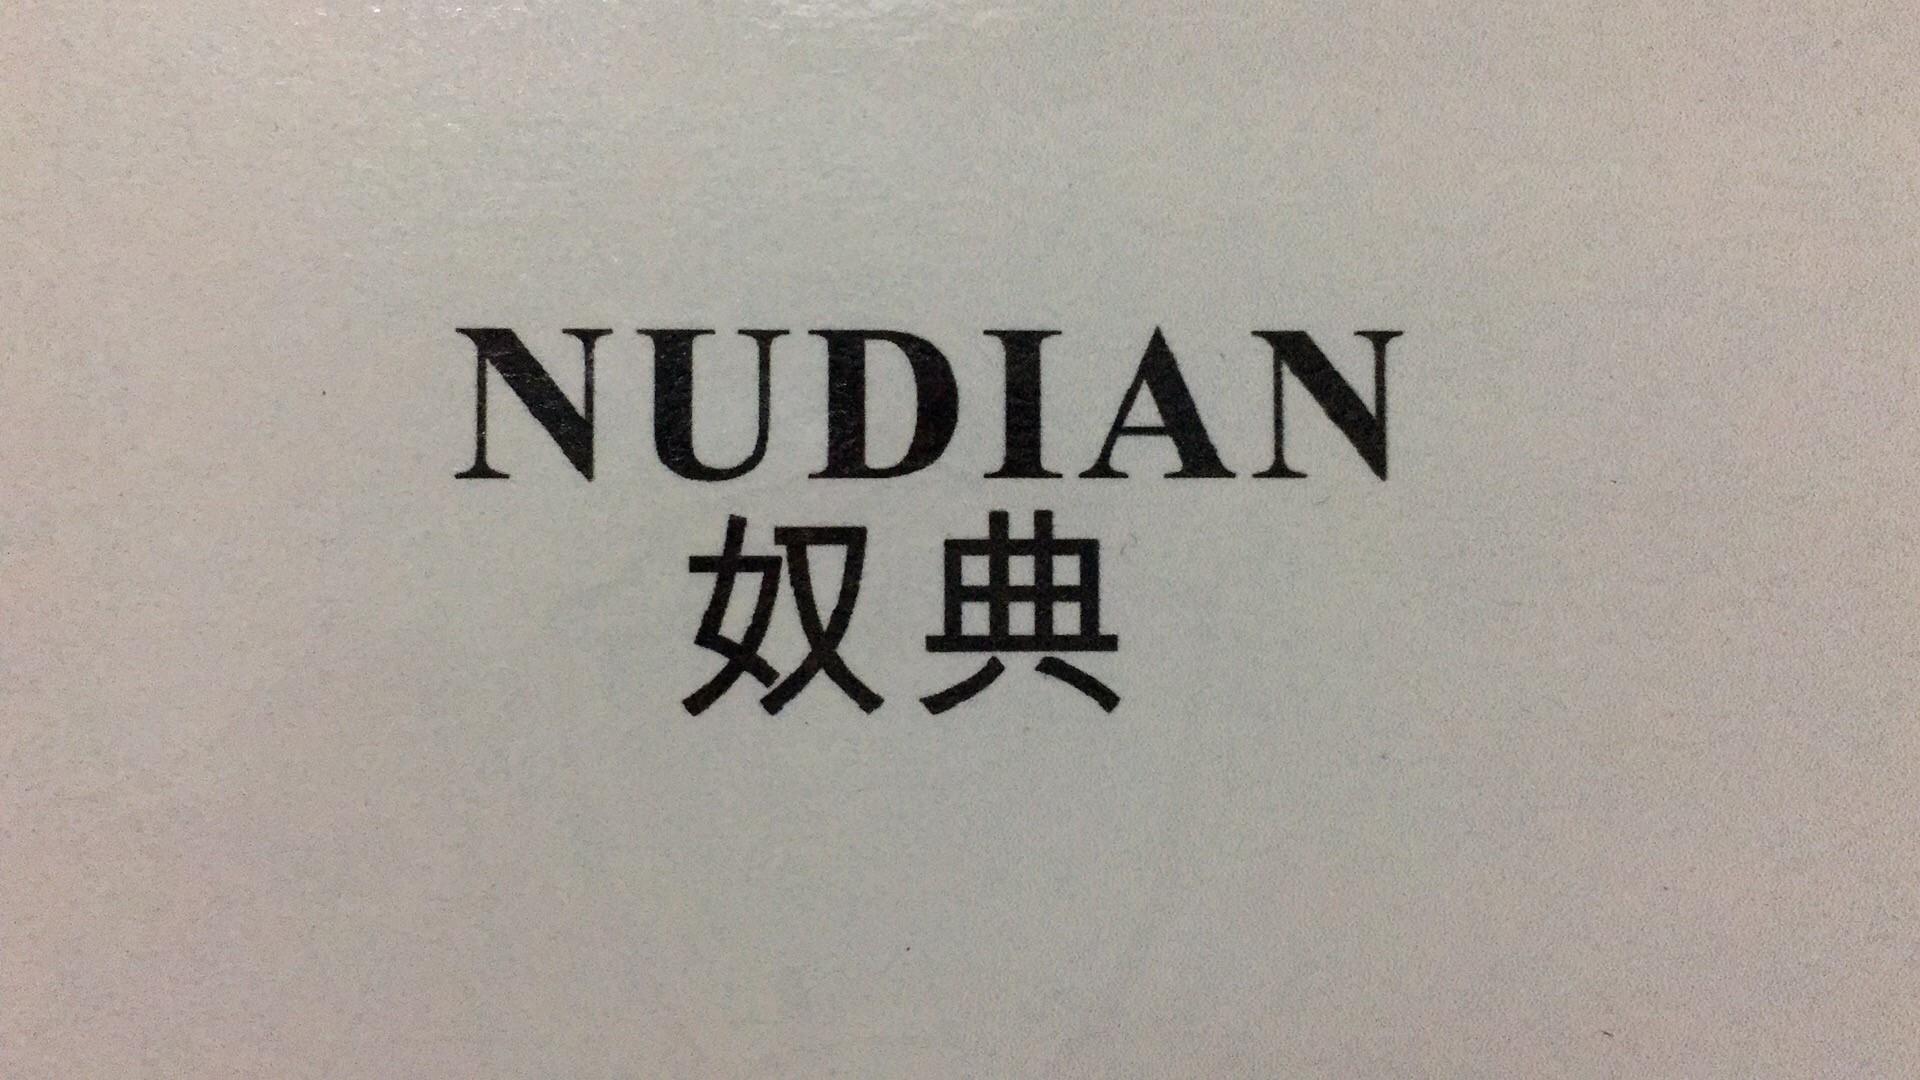 奴典(NUDIAN)